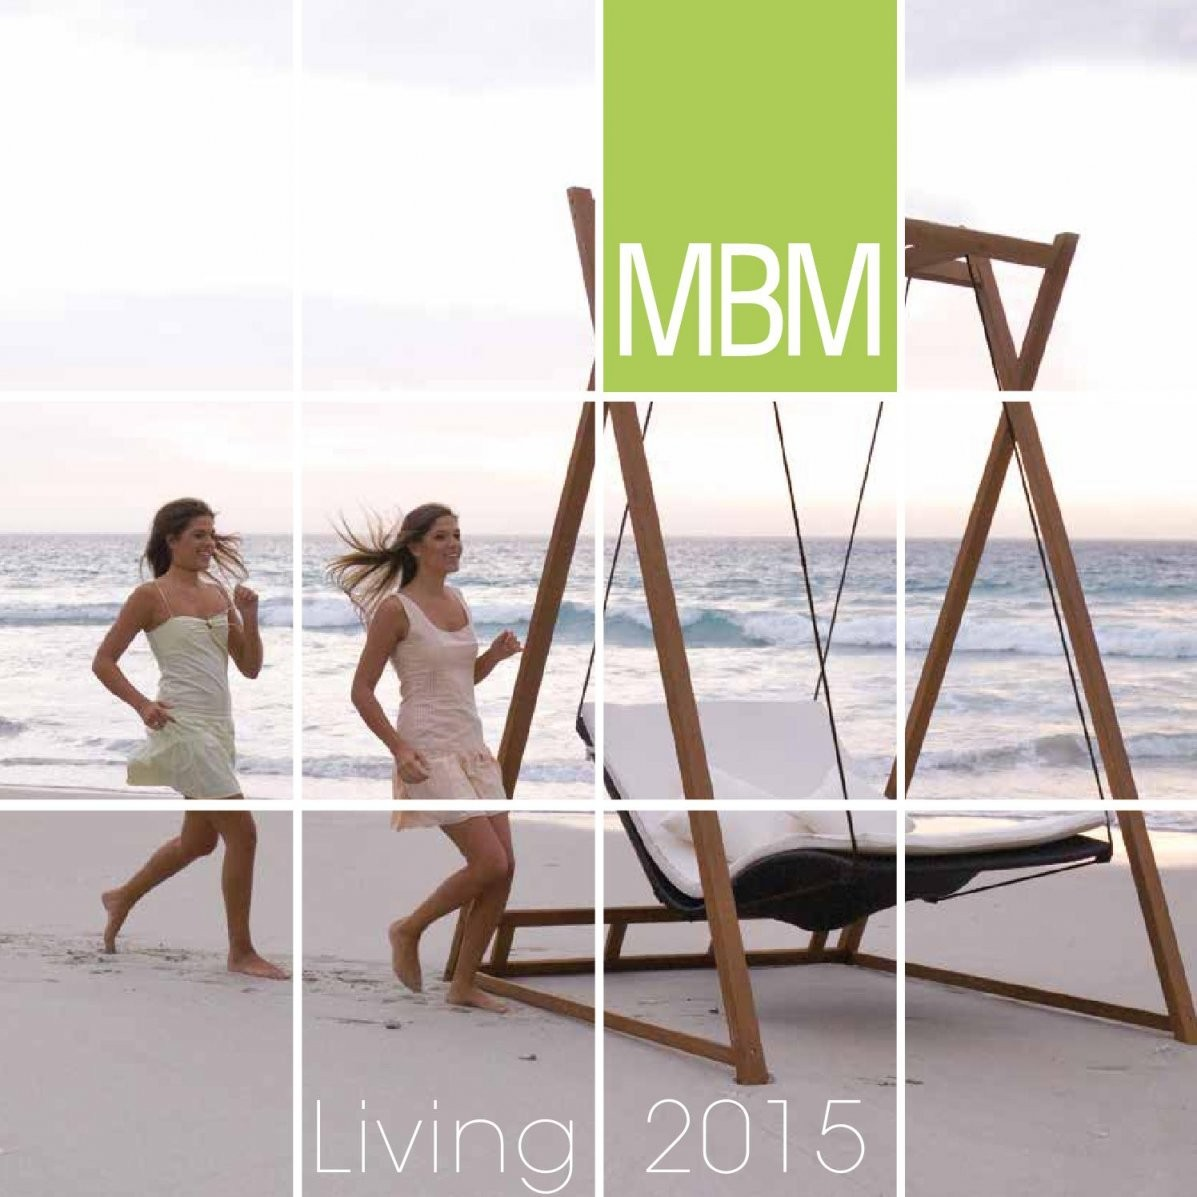 Mbm Living 2015Terrasamebel  Issuu von Mbm Heaven Swing Doppelliege Photo